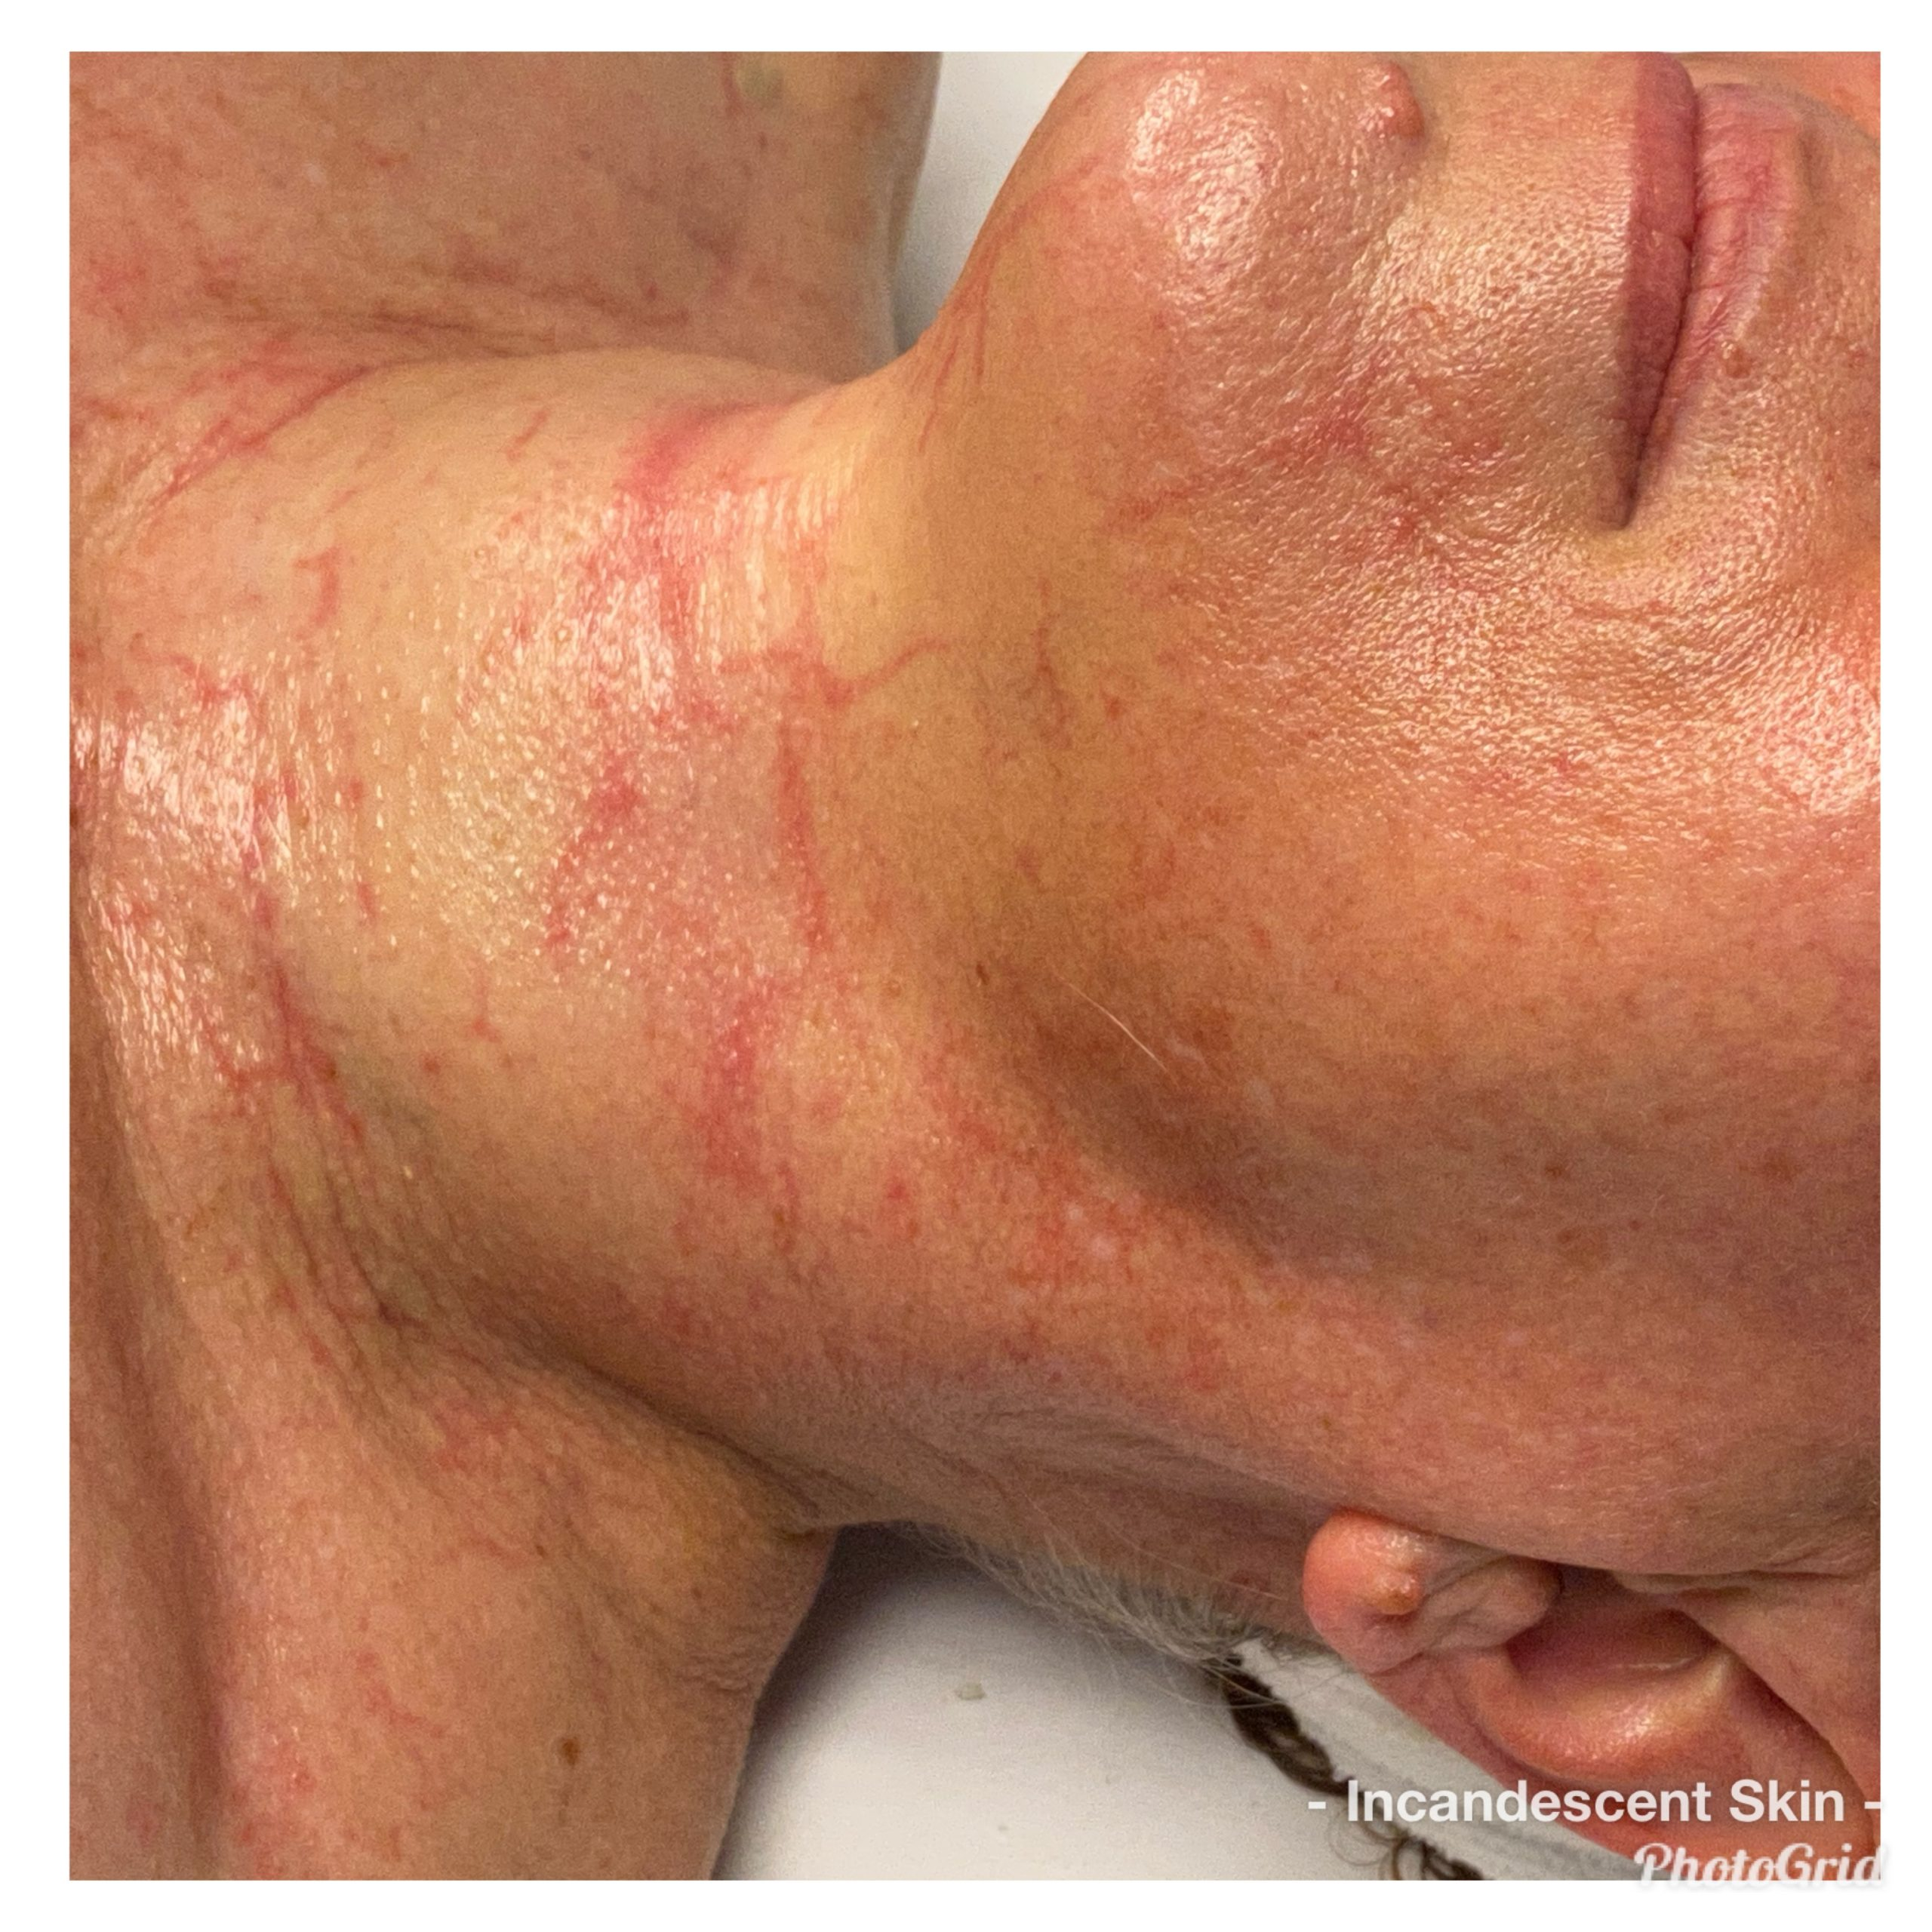 3 Factors to Improve your Skin